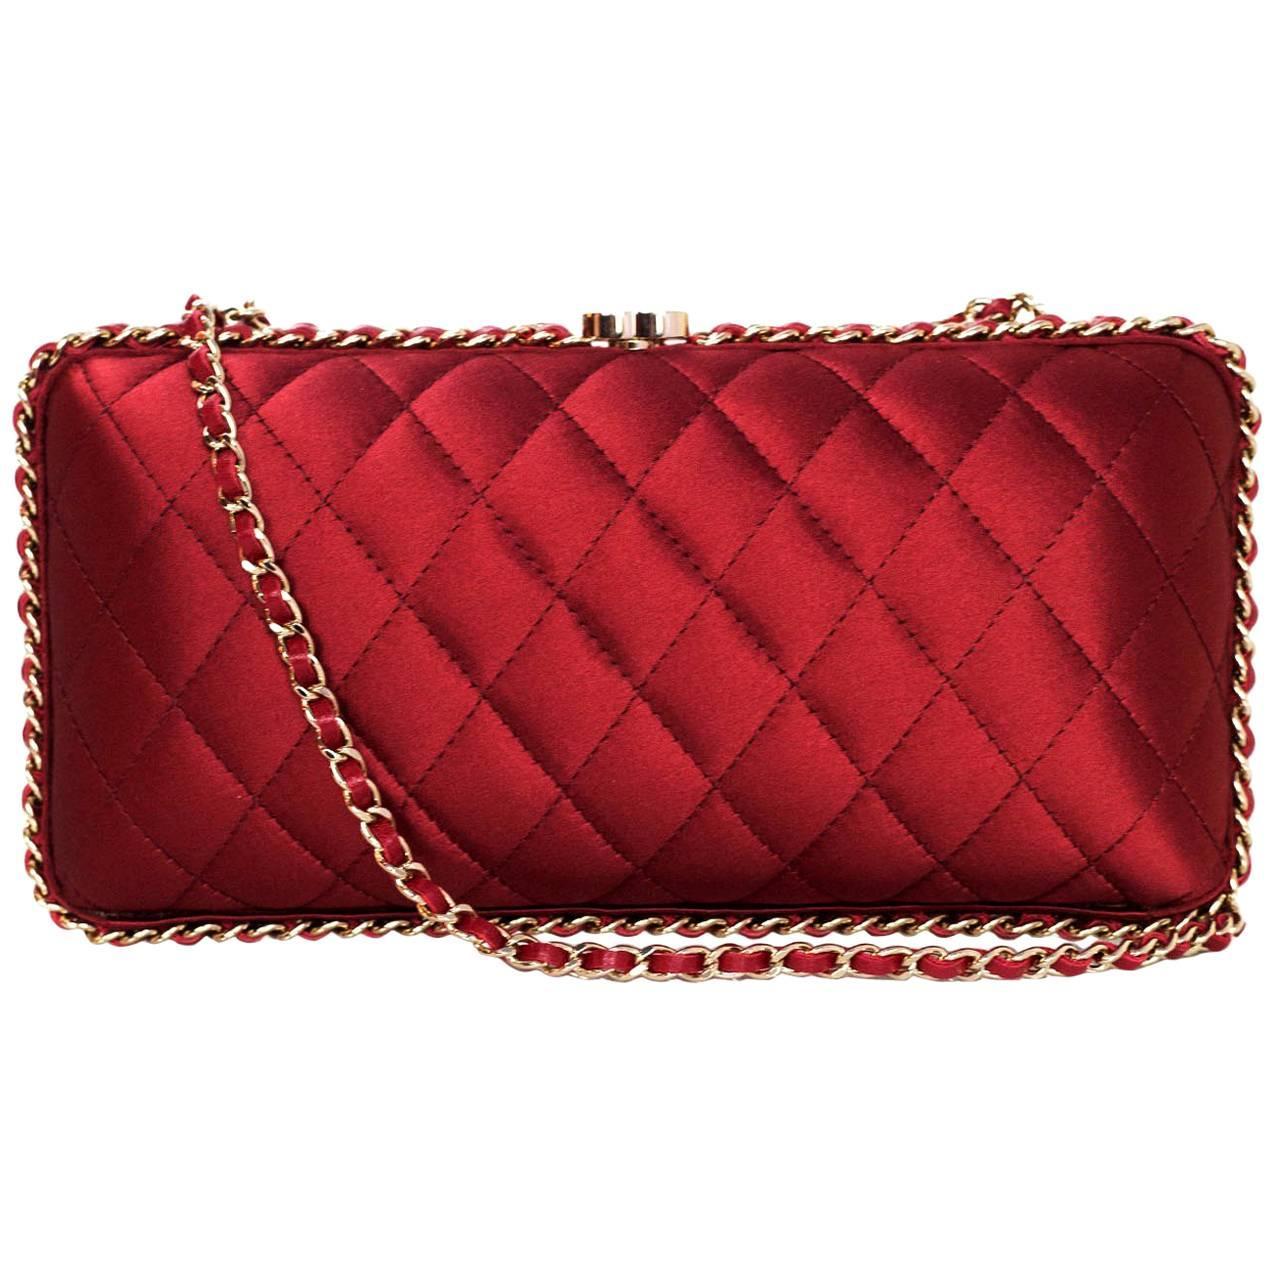 Prada Red Tassel Cord Kisslock Party 2 In 1 Clutch Evening Shoulder Bag In Box PGg86